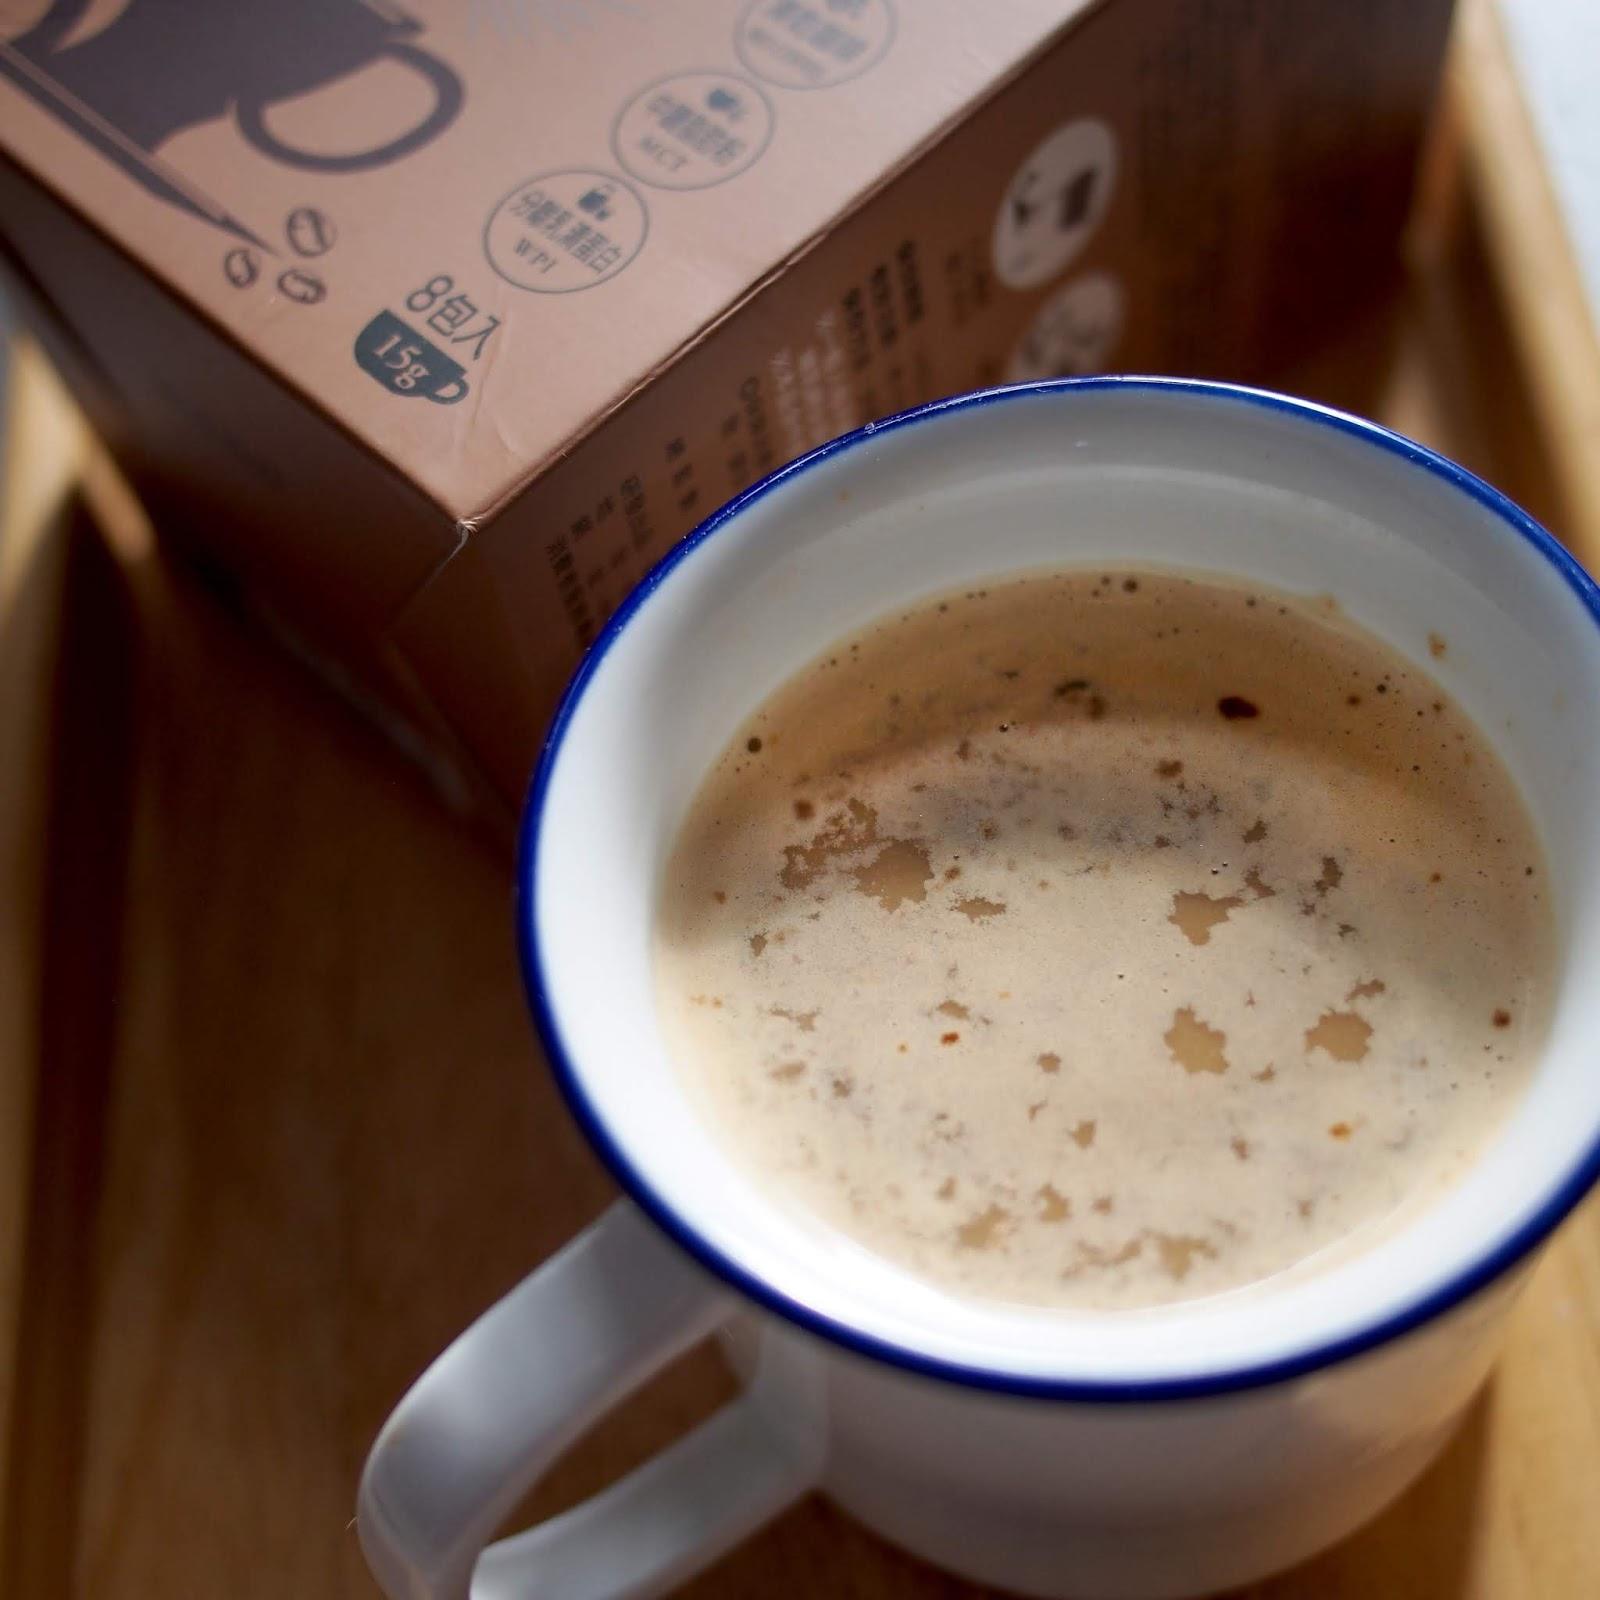 Bulletproof Coffee 防彈咖啡有幾防彈?防唔防到手榴彈?#Keto | 蘋果的化妝箱 by Meling Lam